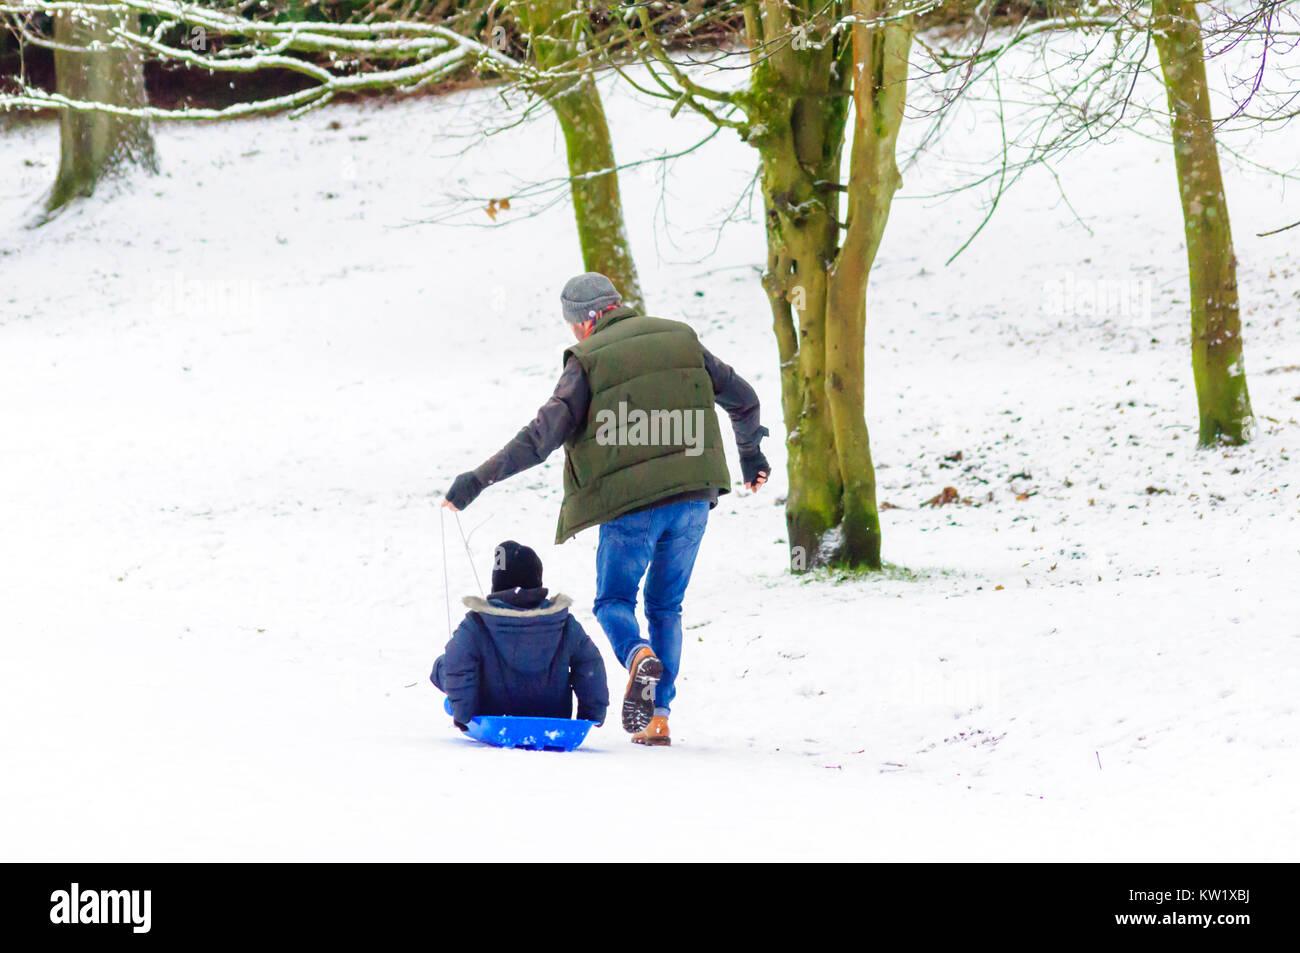 park season seasonal snow snowy cold icy weather wintry